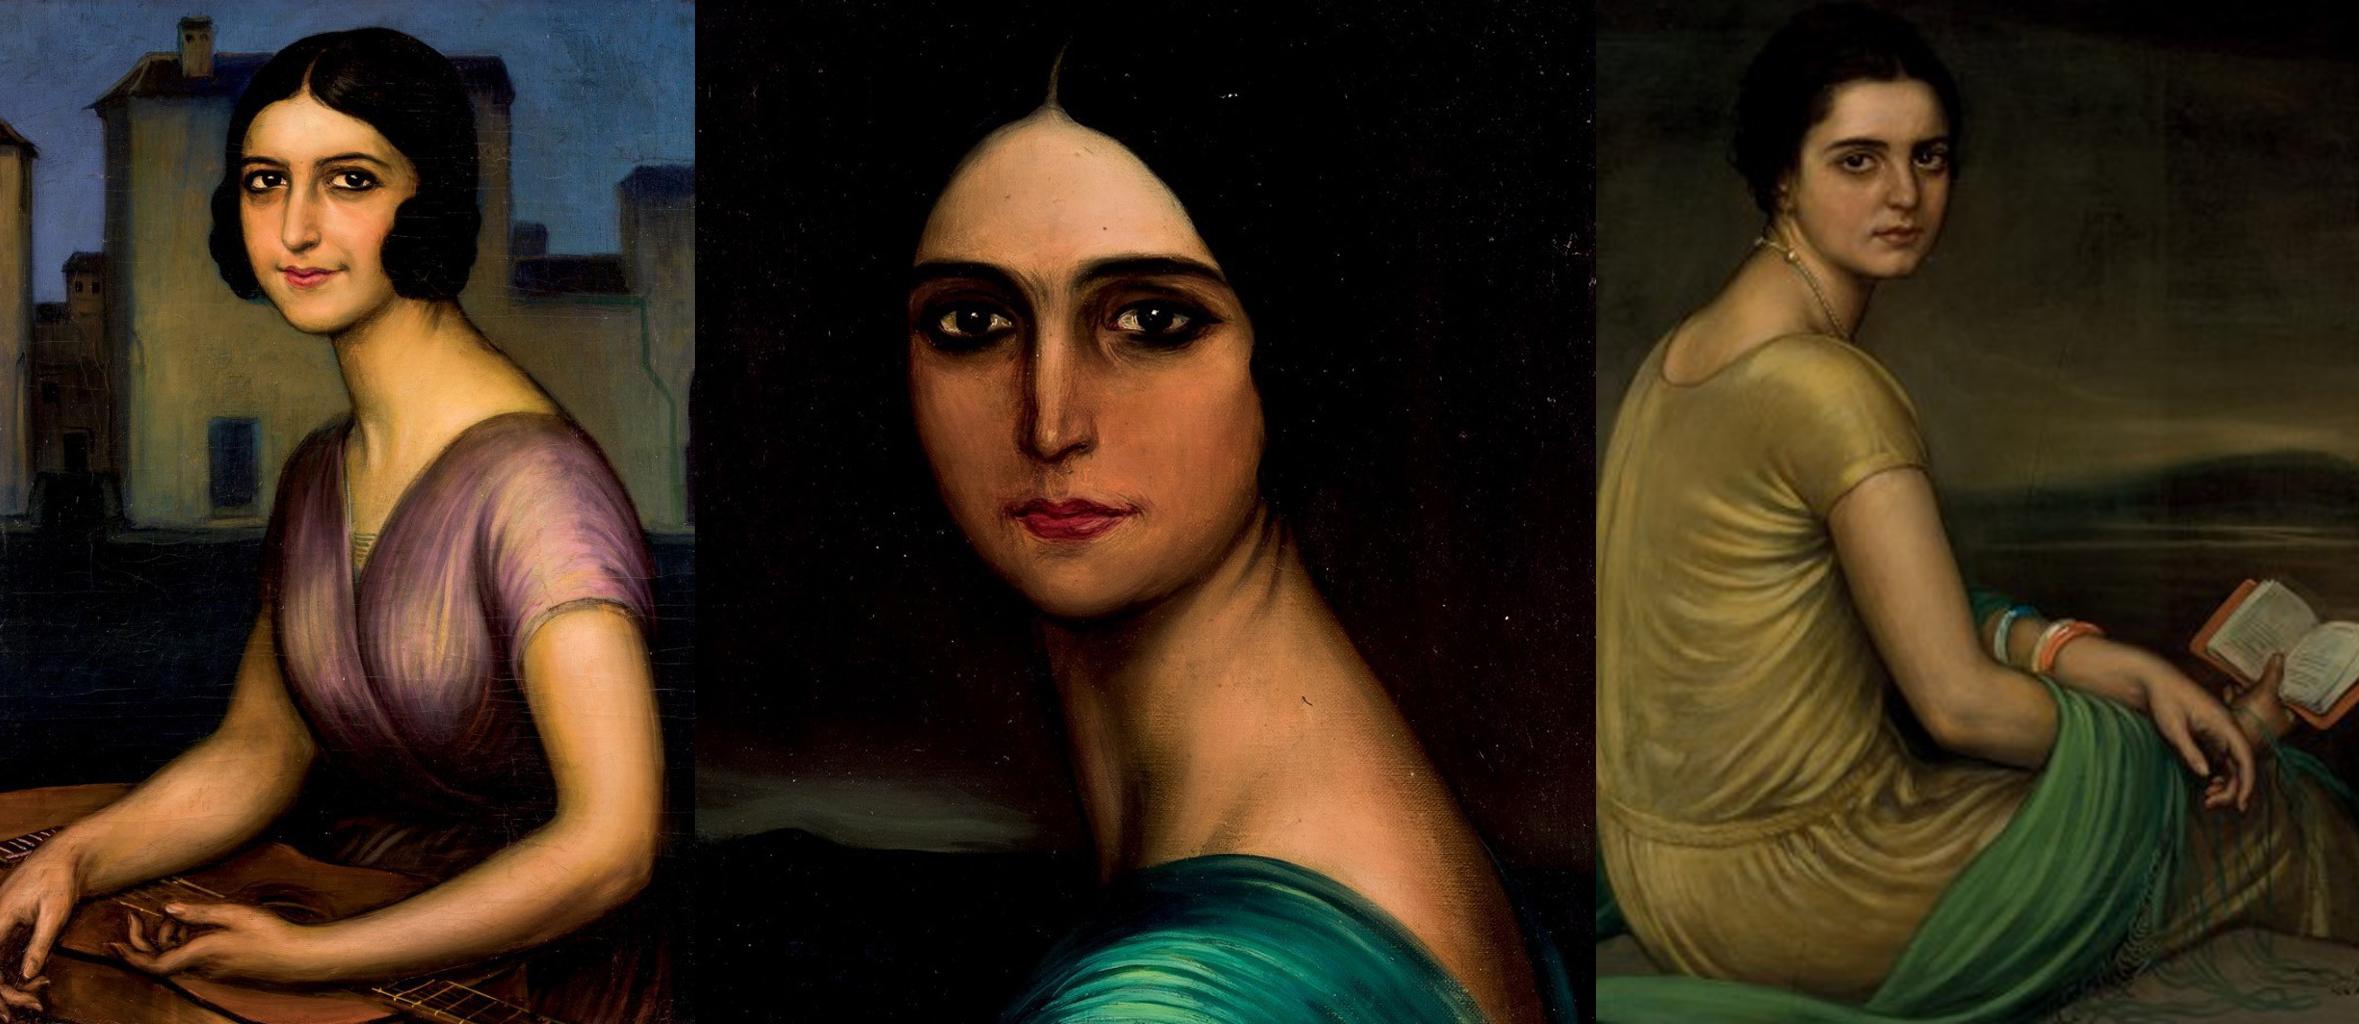 À gauche: Julio Romero de Torres, Señorita Berot, vendu le 23/3/17 Au centre: Julio Romero de Torres, Mujer morena, vendu le 26/1/17 pour 25 000 € À droite: Julio Romero de Torres, Retrato Srta de Alfonso, vendu le 22/9/16 pour 150 000 €